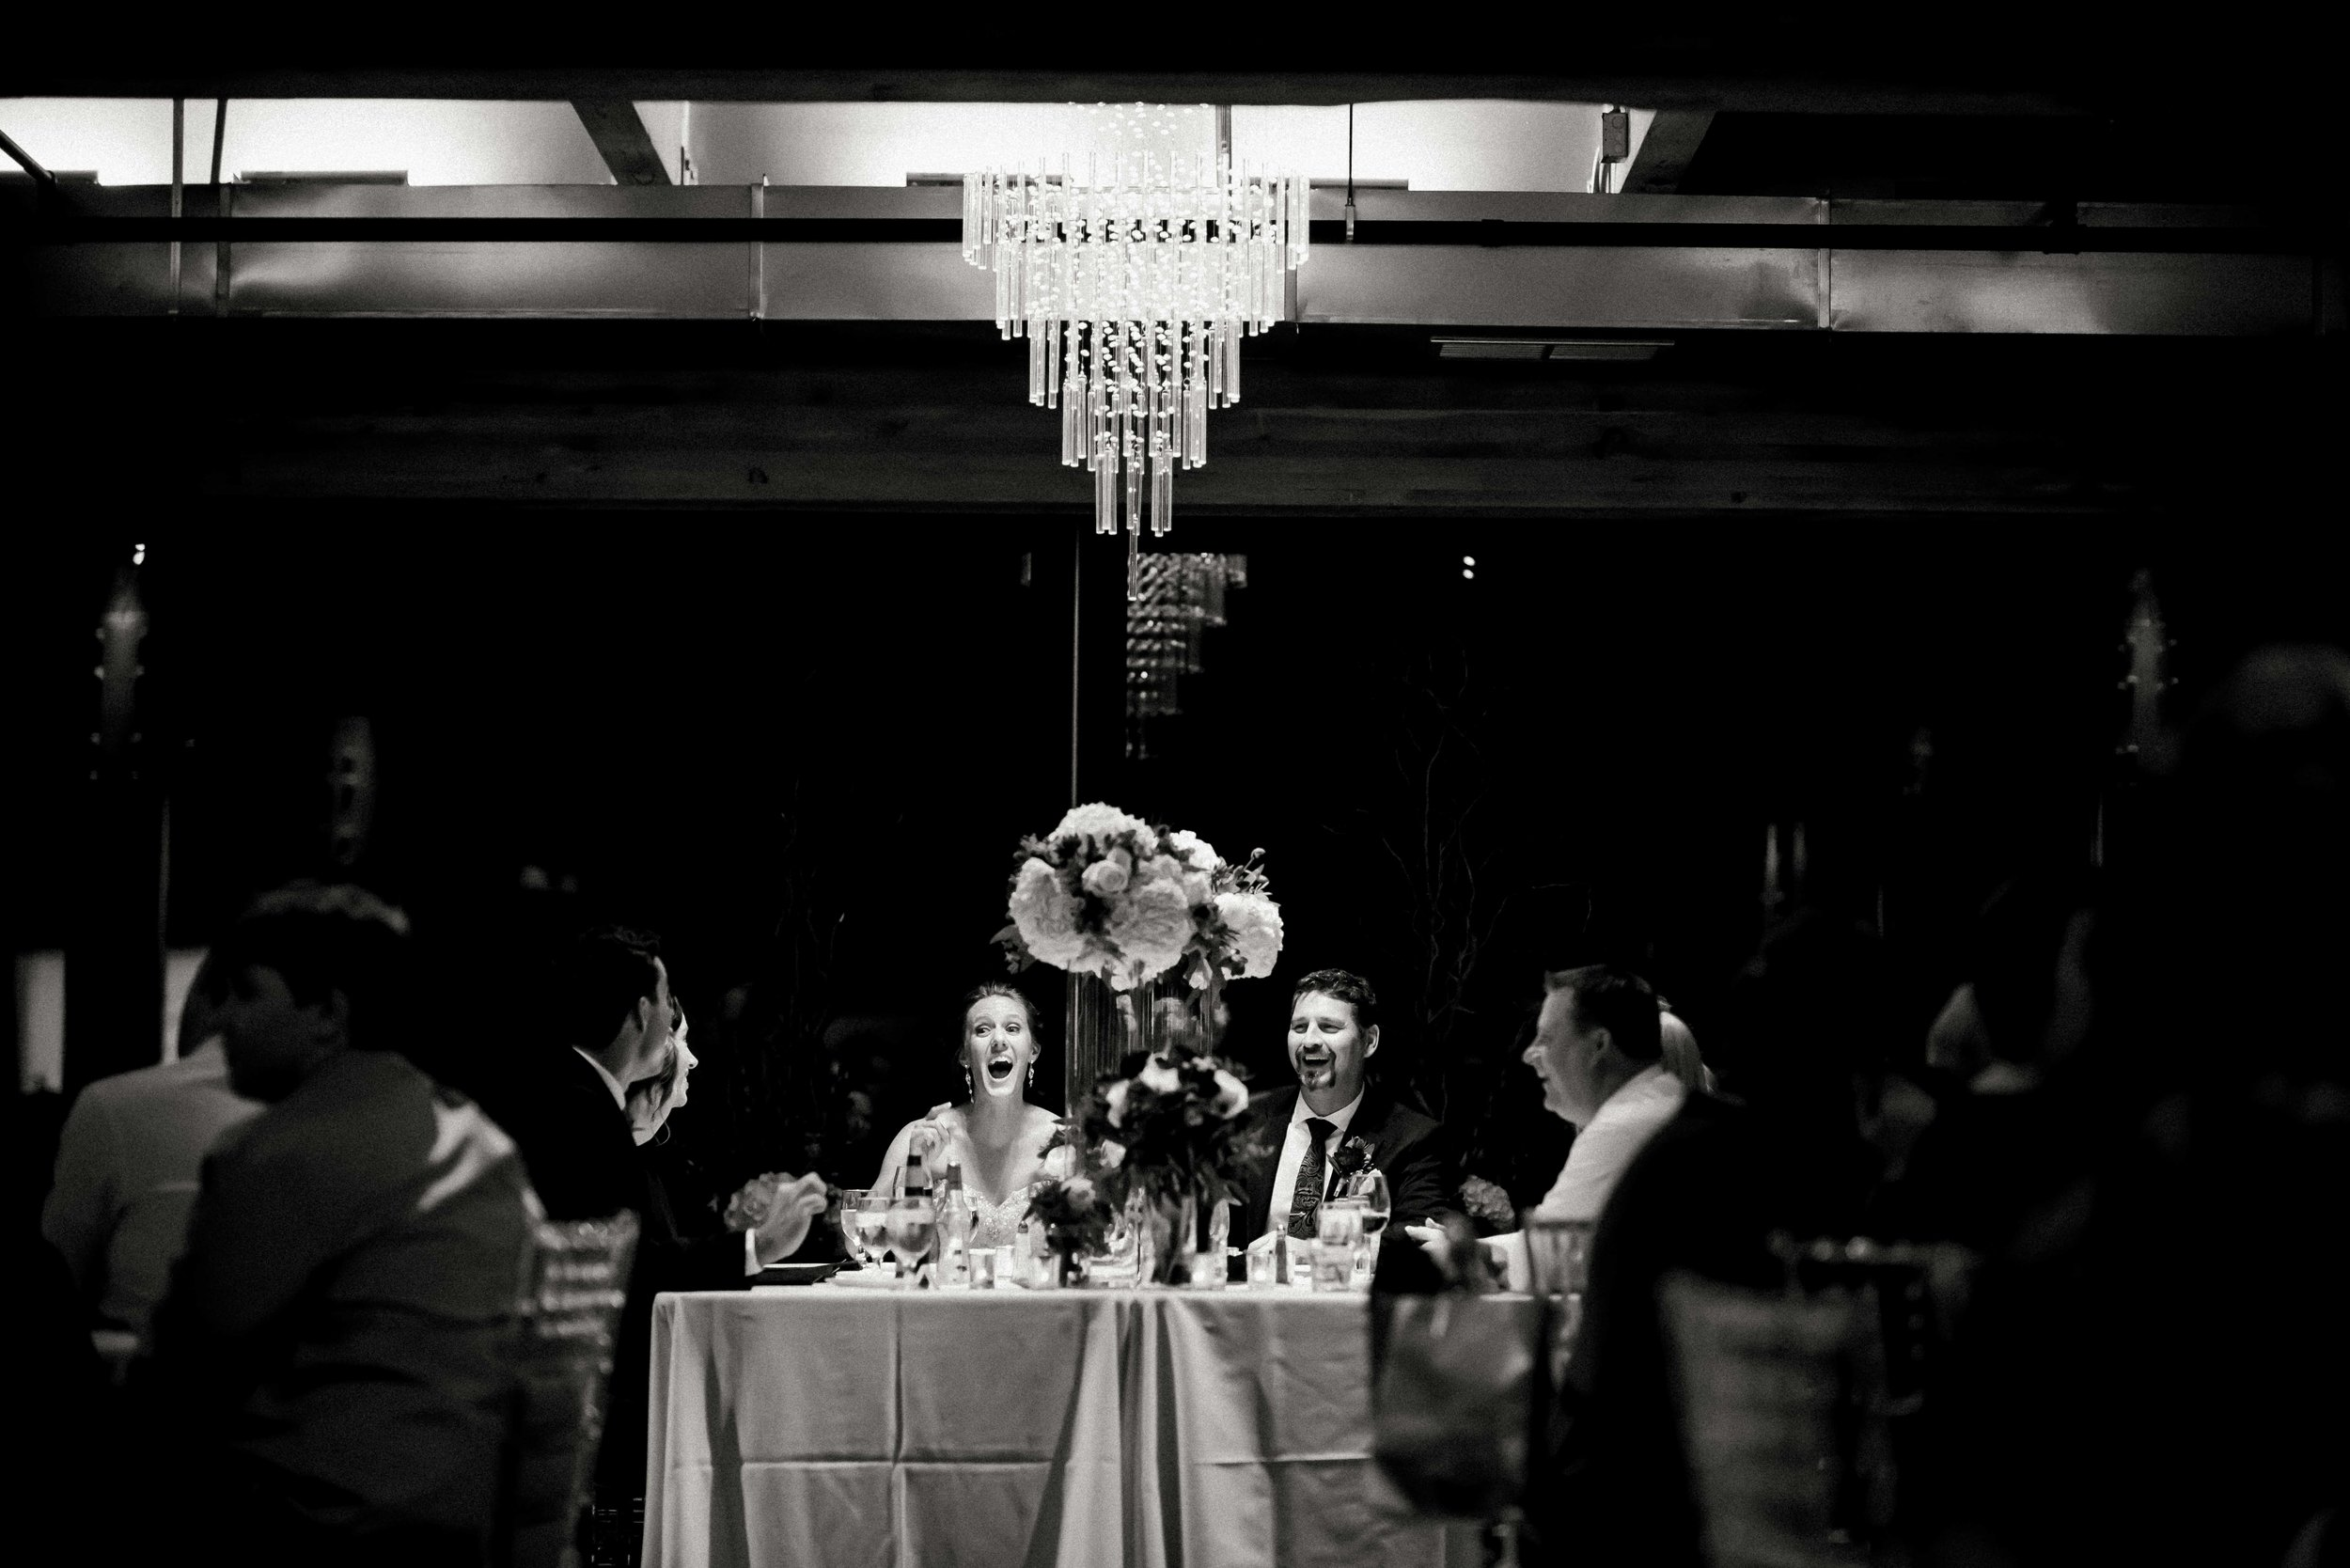 Minneapolis St Paul Twin Cities John Notman Wedding Engagement Best Candid Documentary Photography-4149.jpg